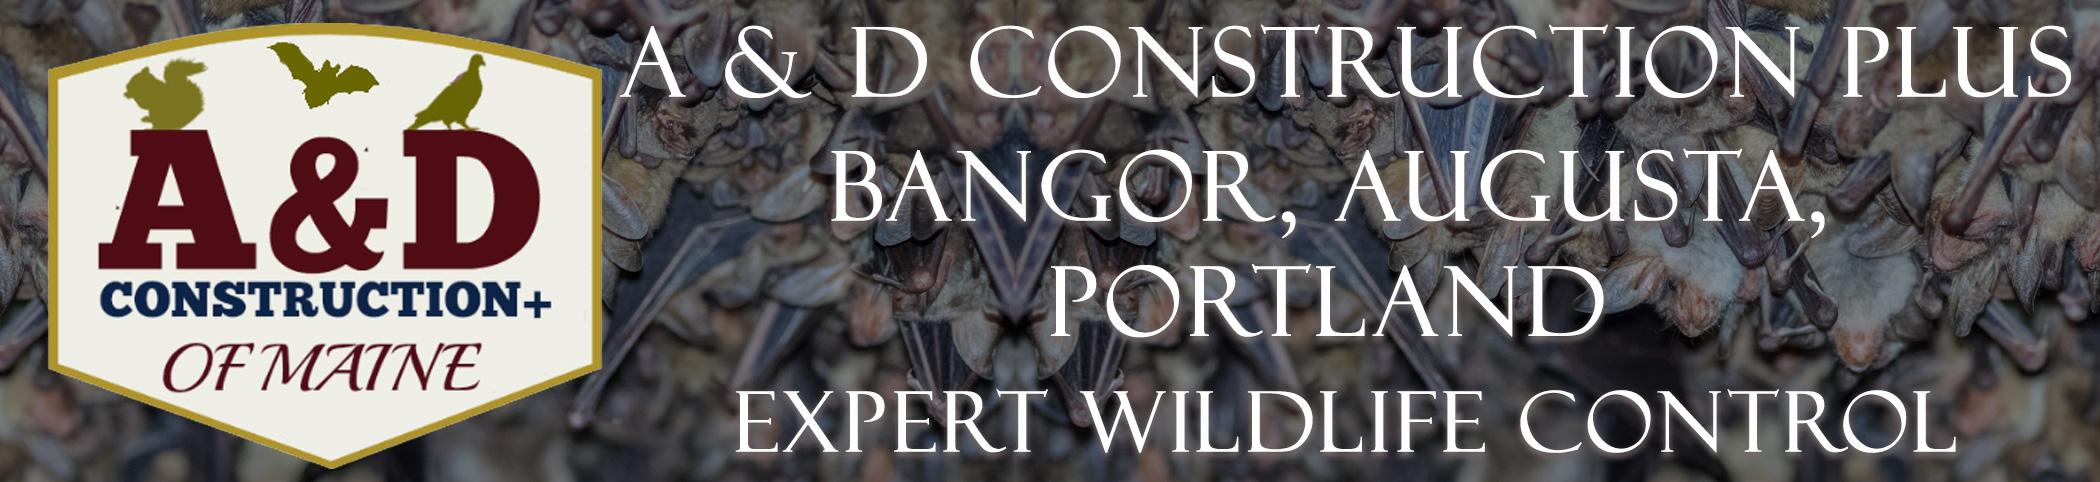 bangor augusta portland maine header image at header image at bat removal pro